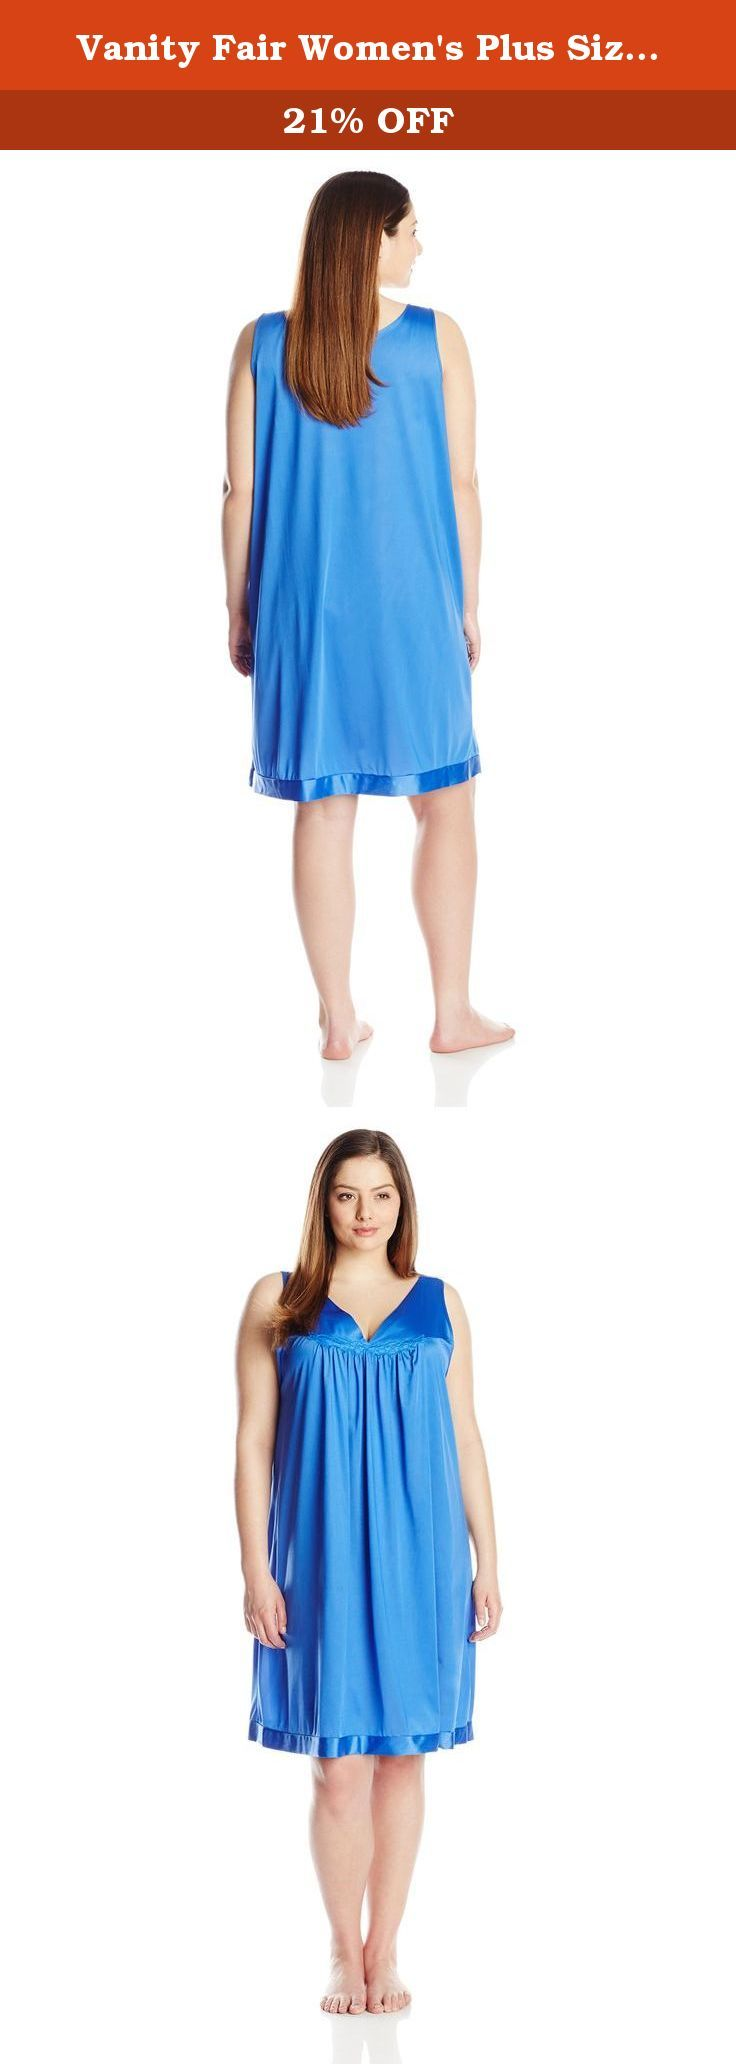 Vanity Fair Women\'s Plus Size Coloratura Sleepwear Short Gown 30807 ...